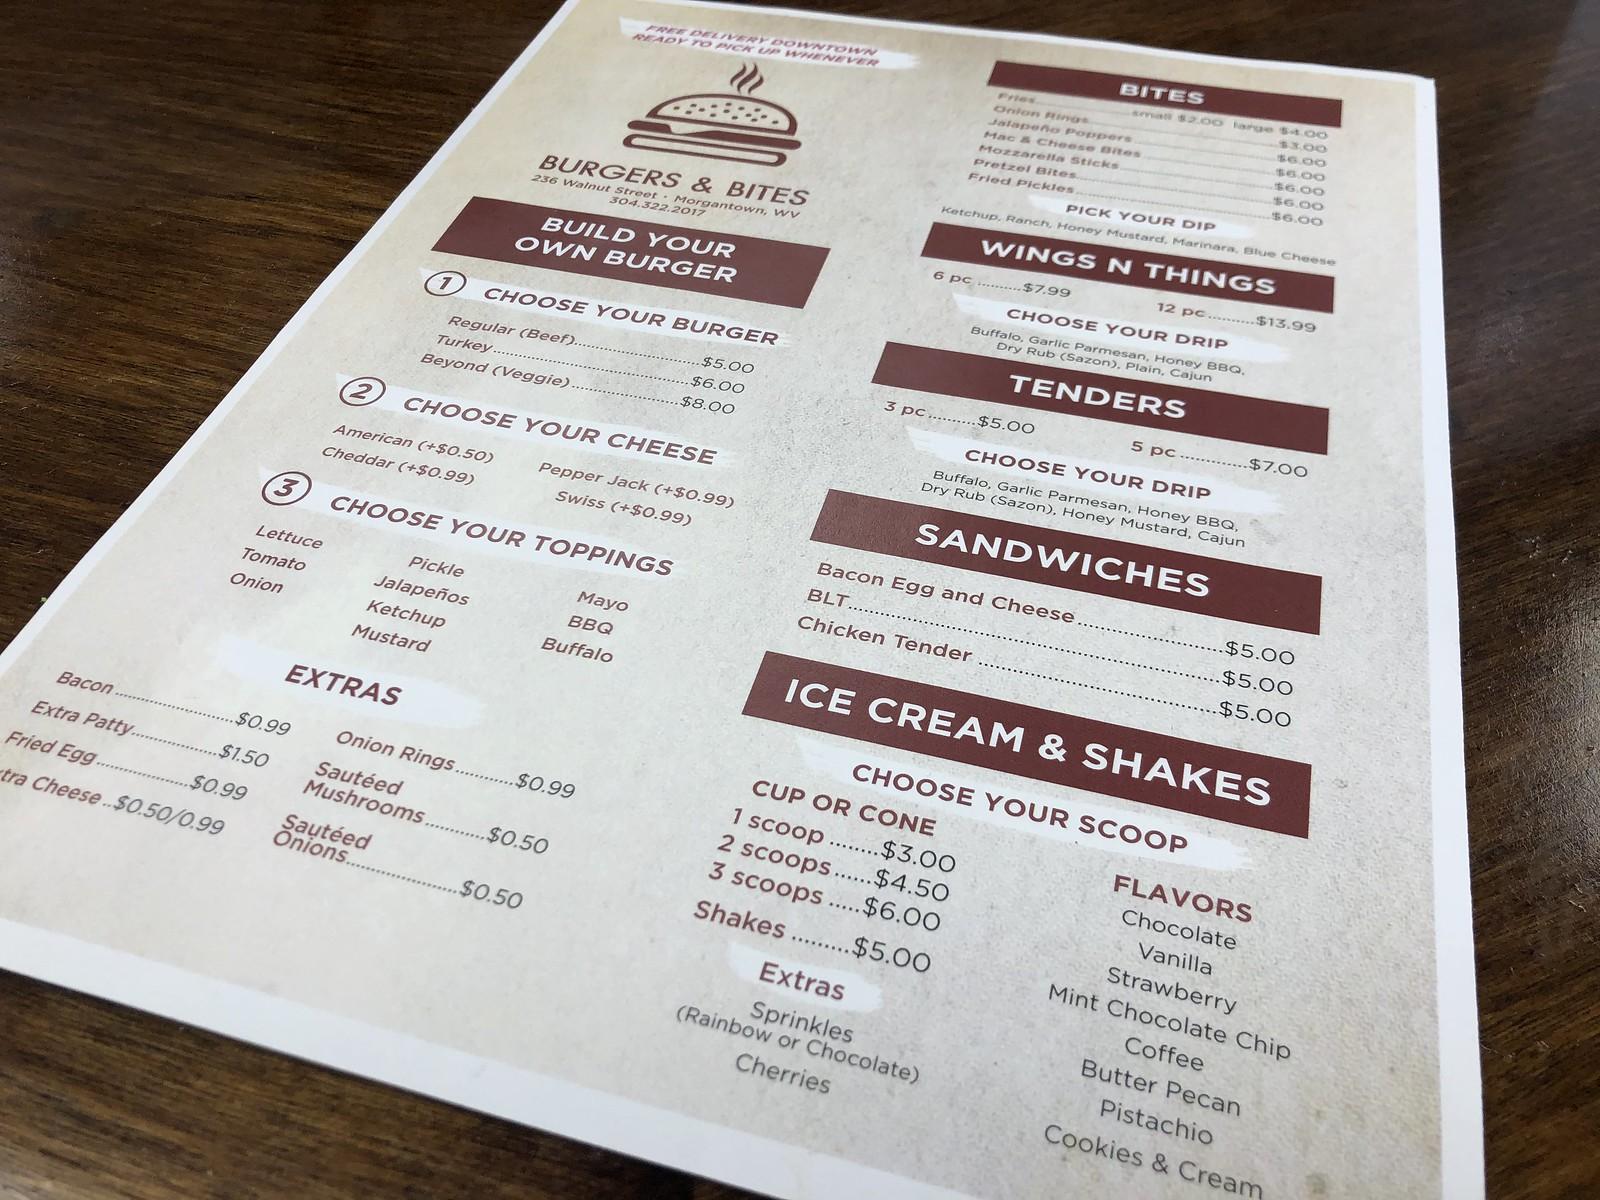 Burgers & Bites WV